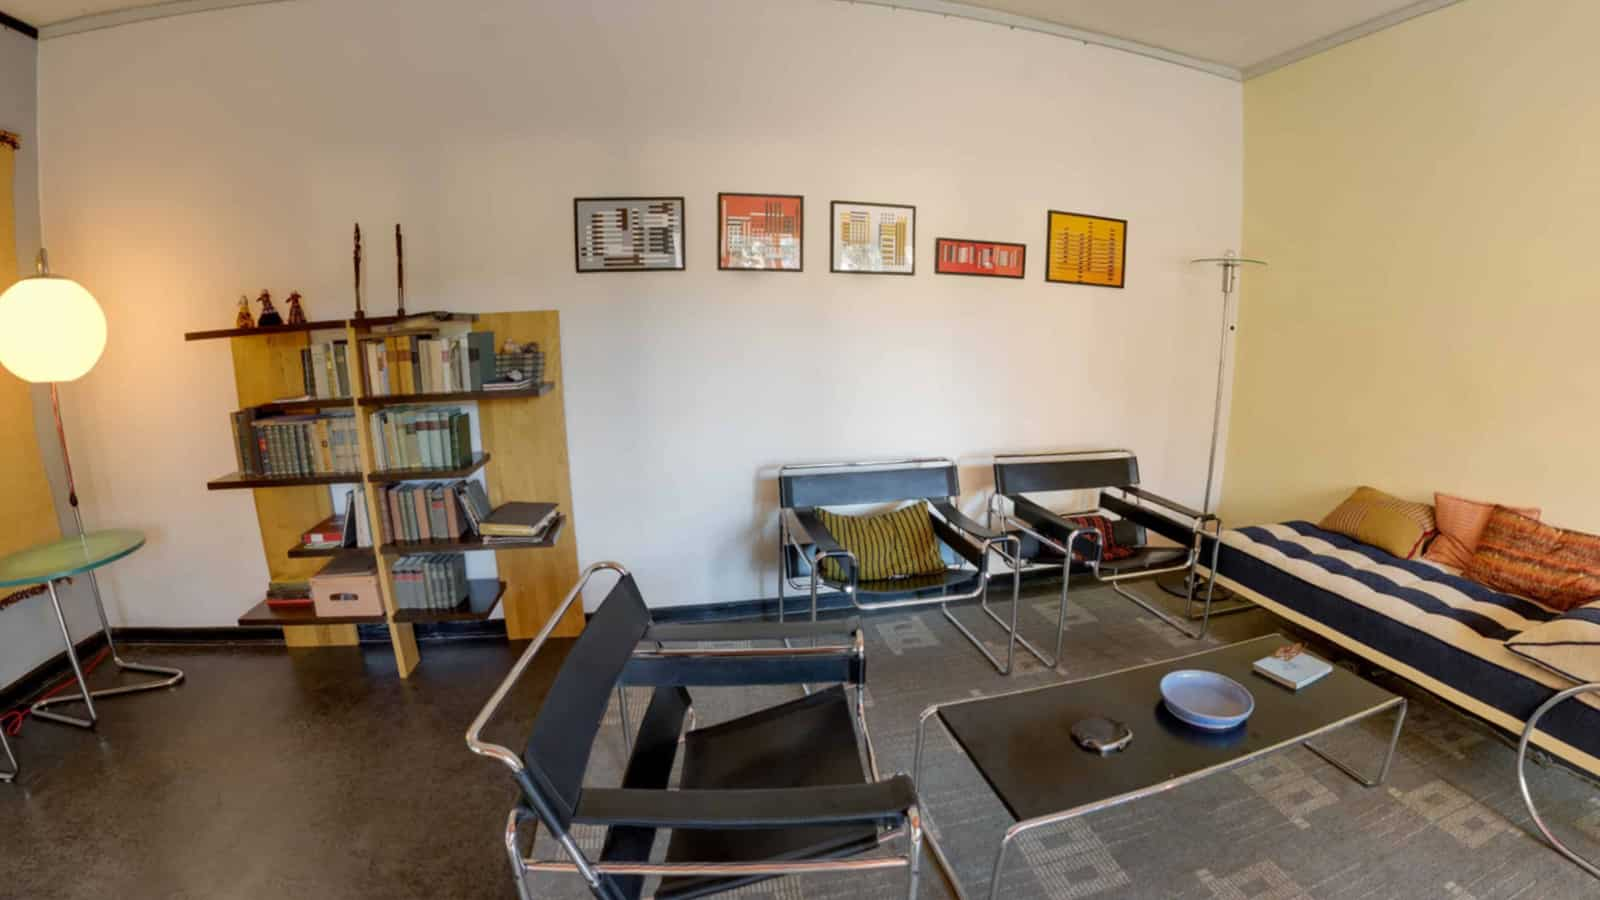 Lotte Am Bauhaus Credits